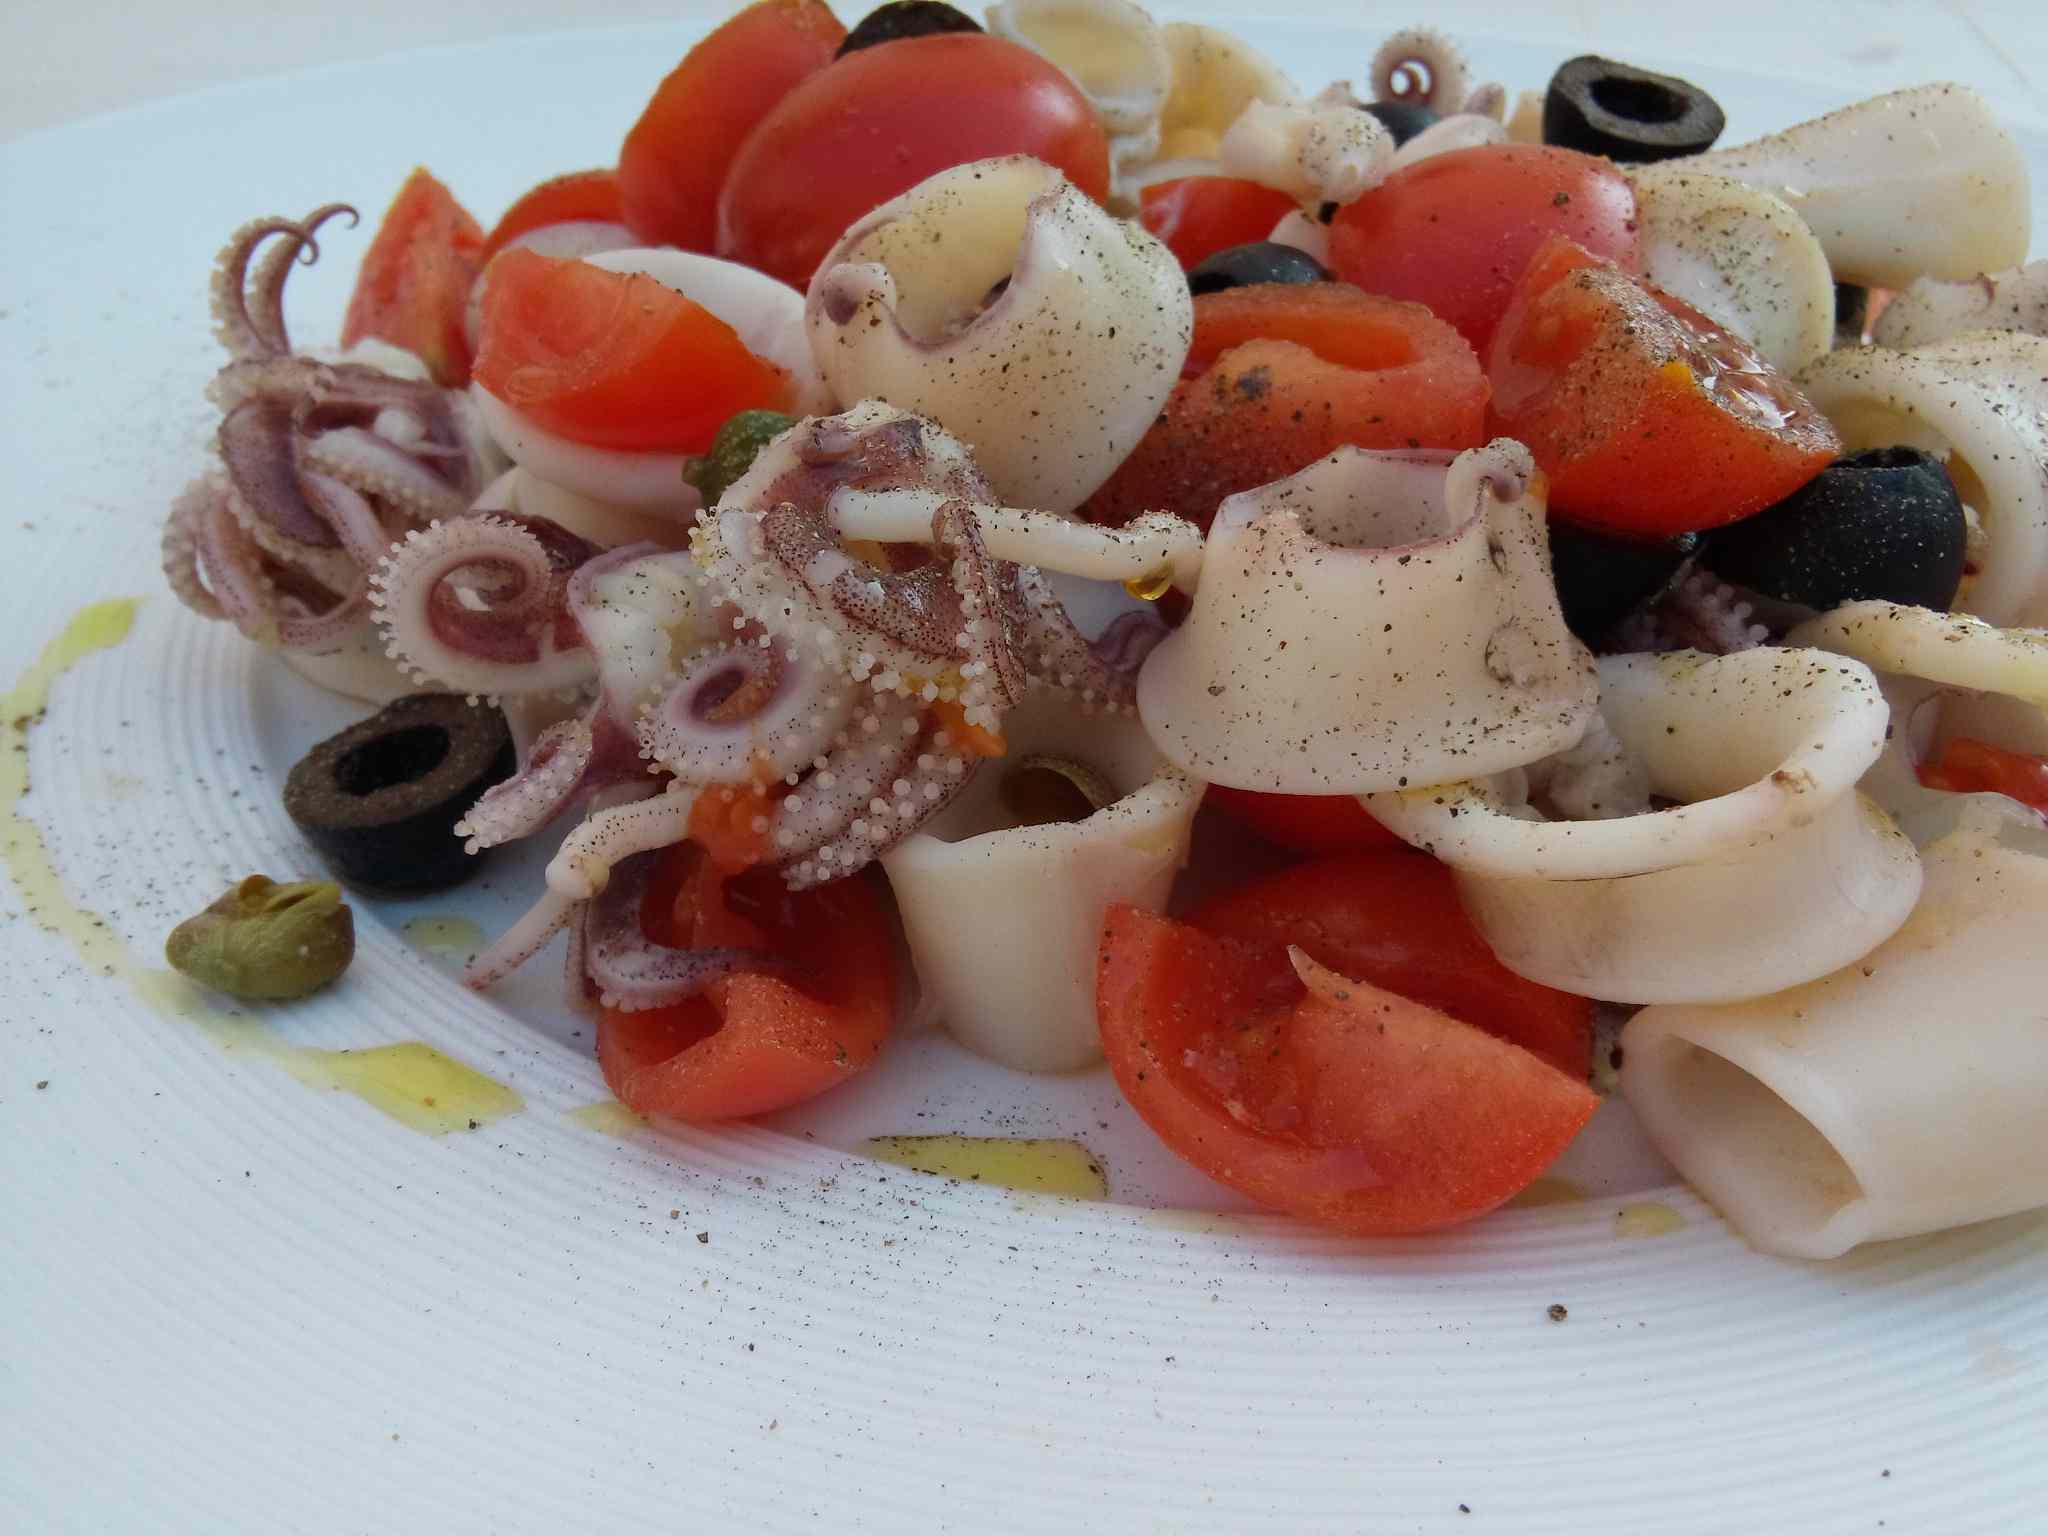 Ricetta: Insalata di calamari, pomodorini, capperi ed olive